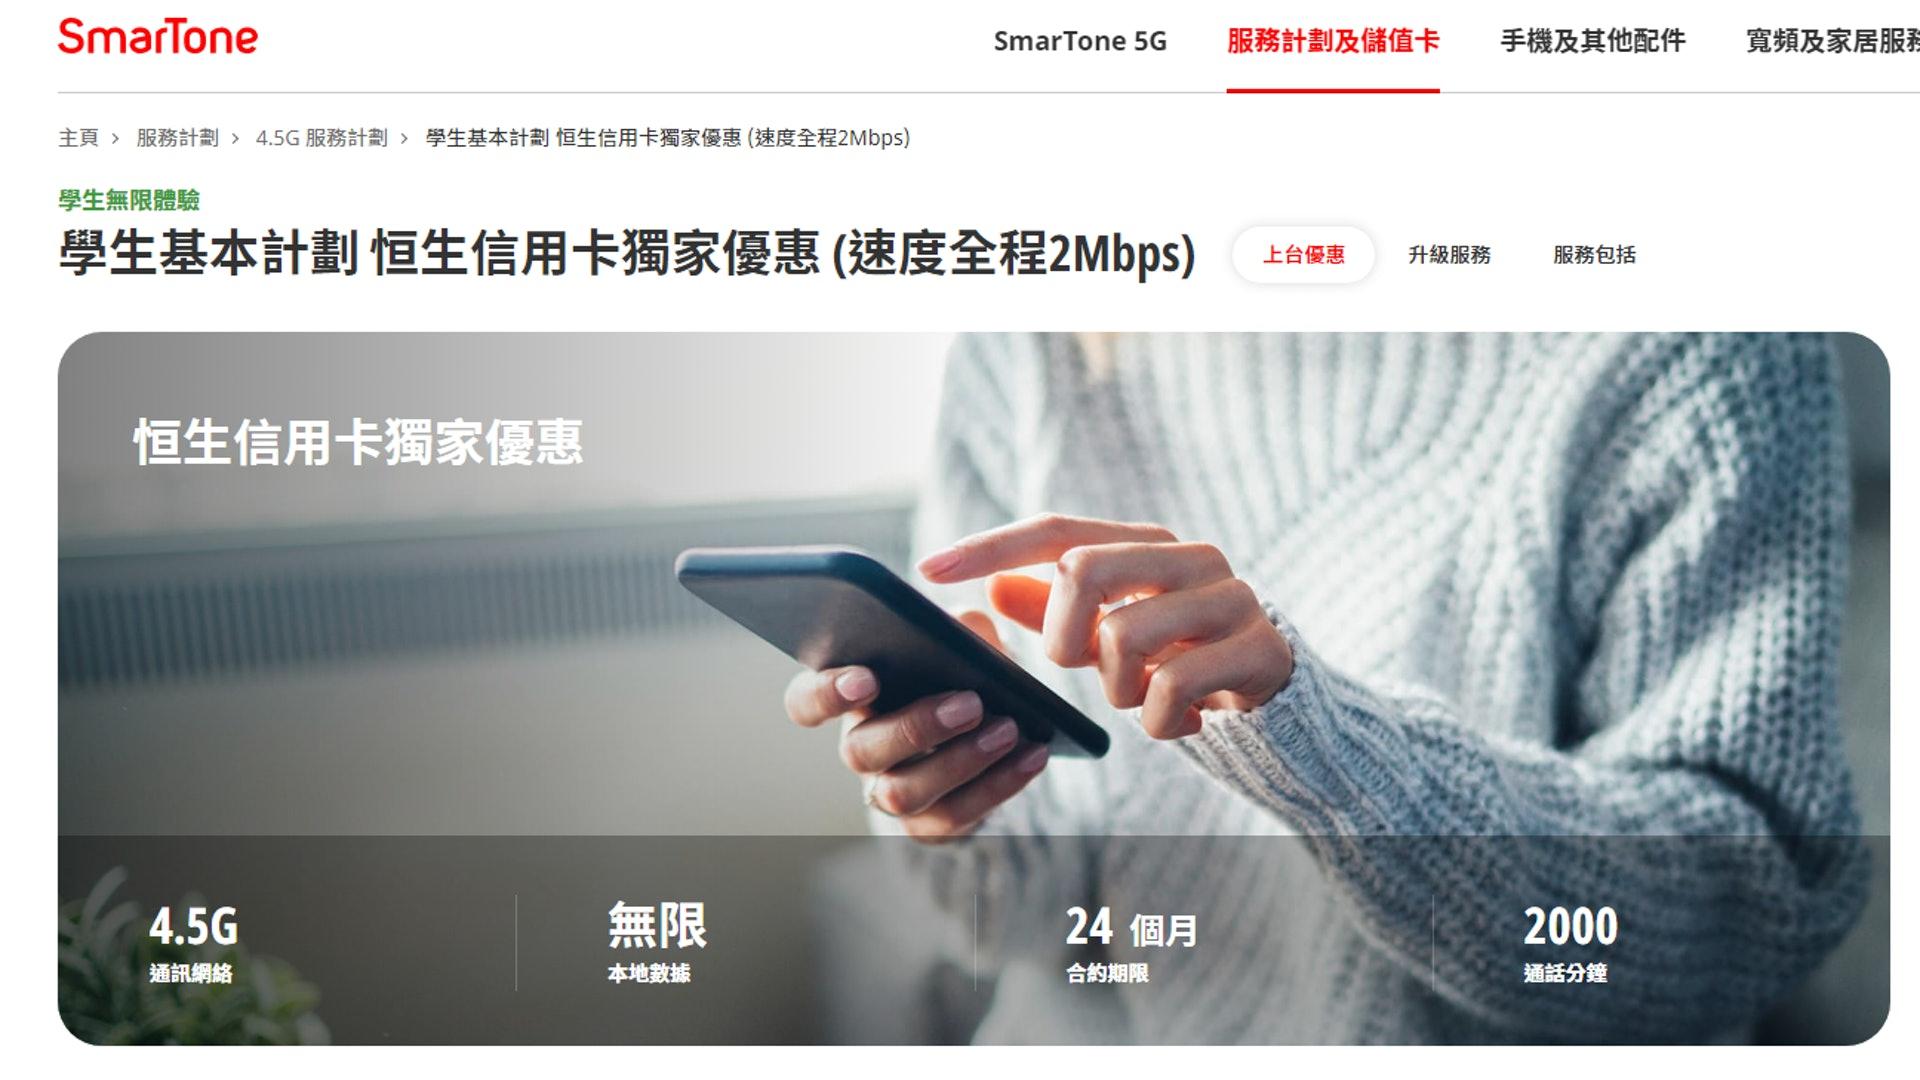 SmarTone獨家優惠4.5G學生基本計劃(SmarTone網頁截圖)